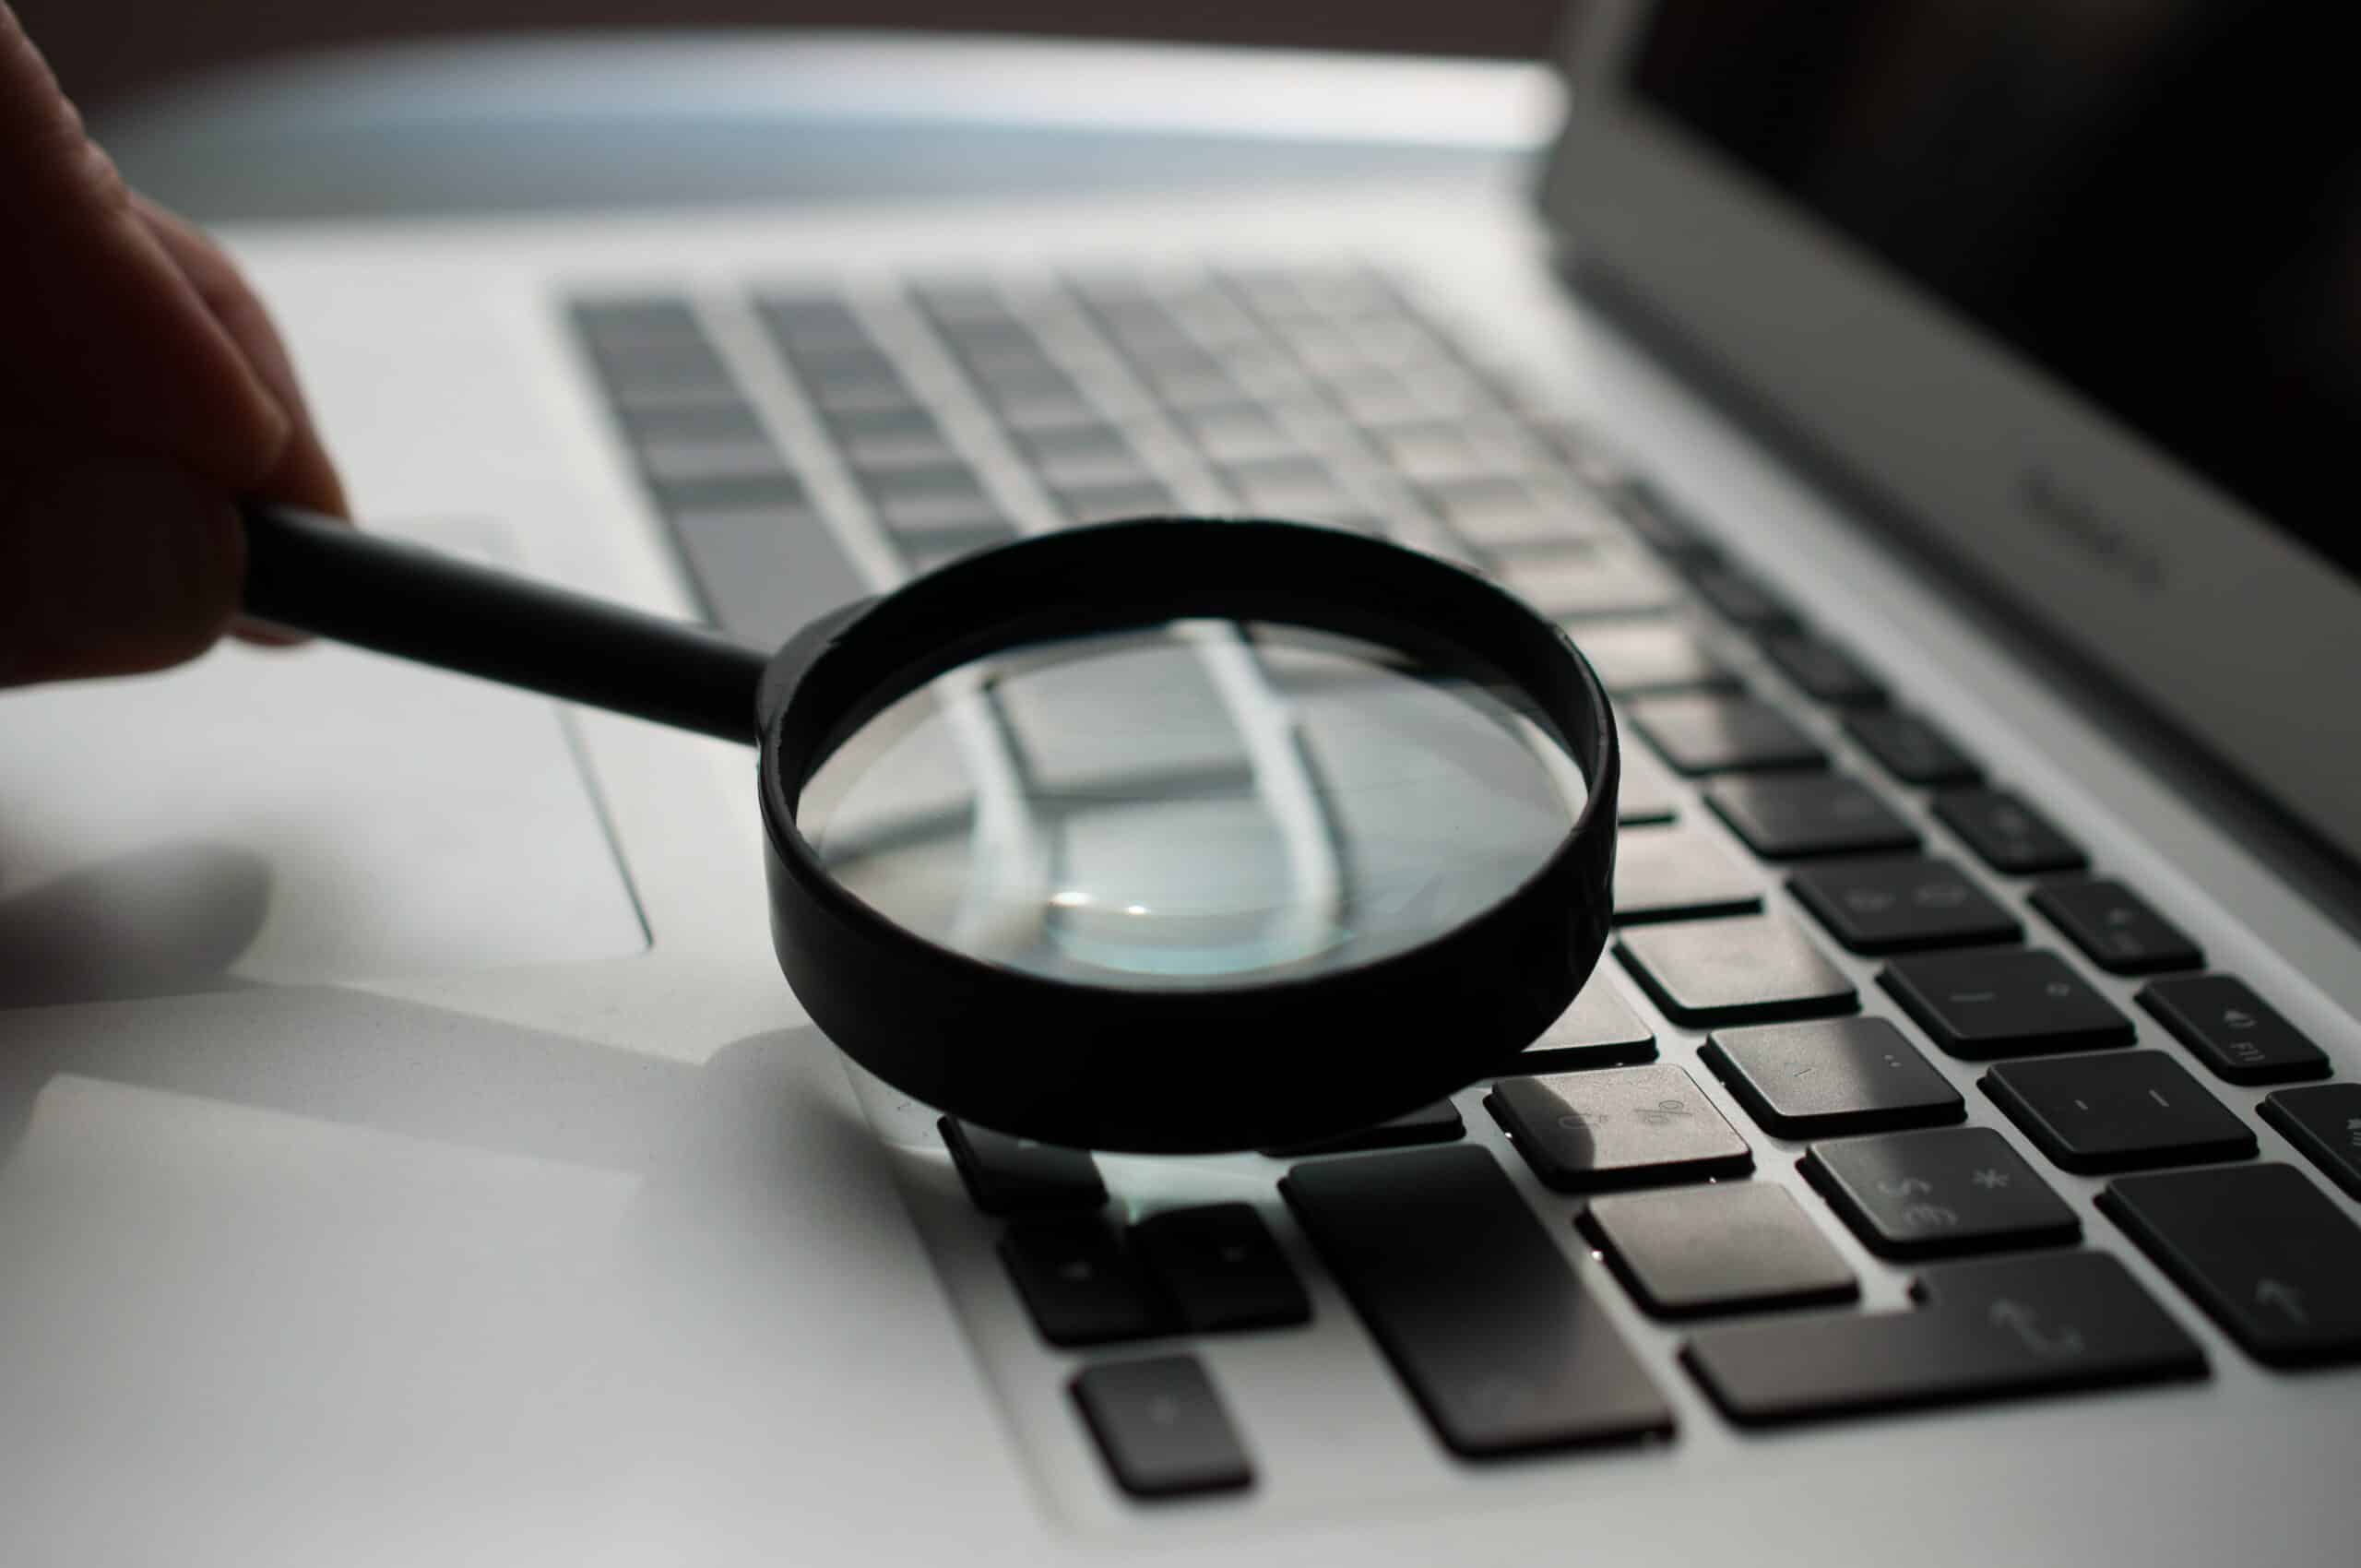 magnifying glass above laptop keyboard